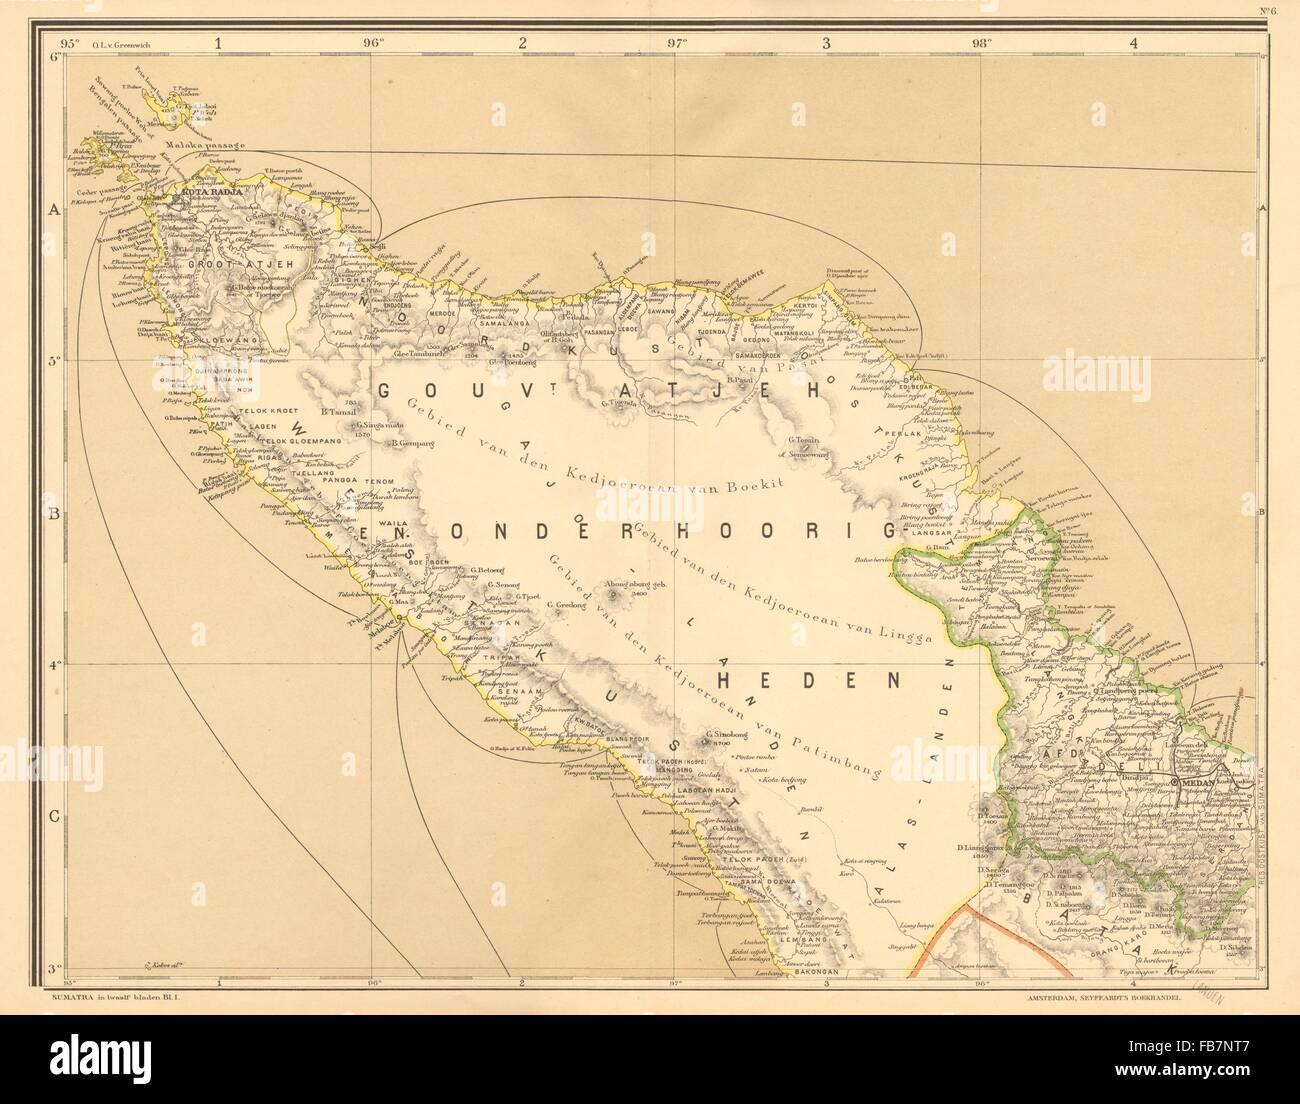 DUTCH EAST INDIES Indonesia N SUMATRA Banda Stock Photo 92983863